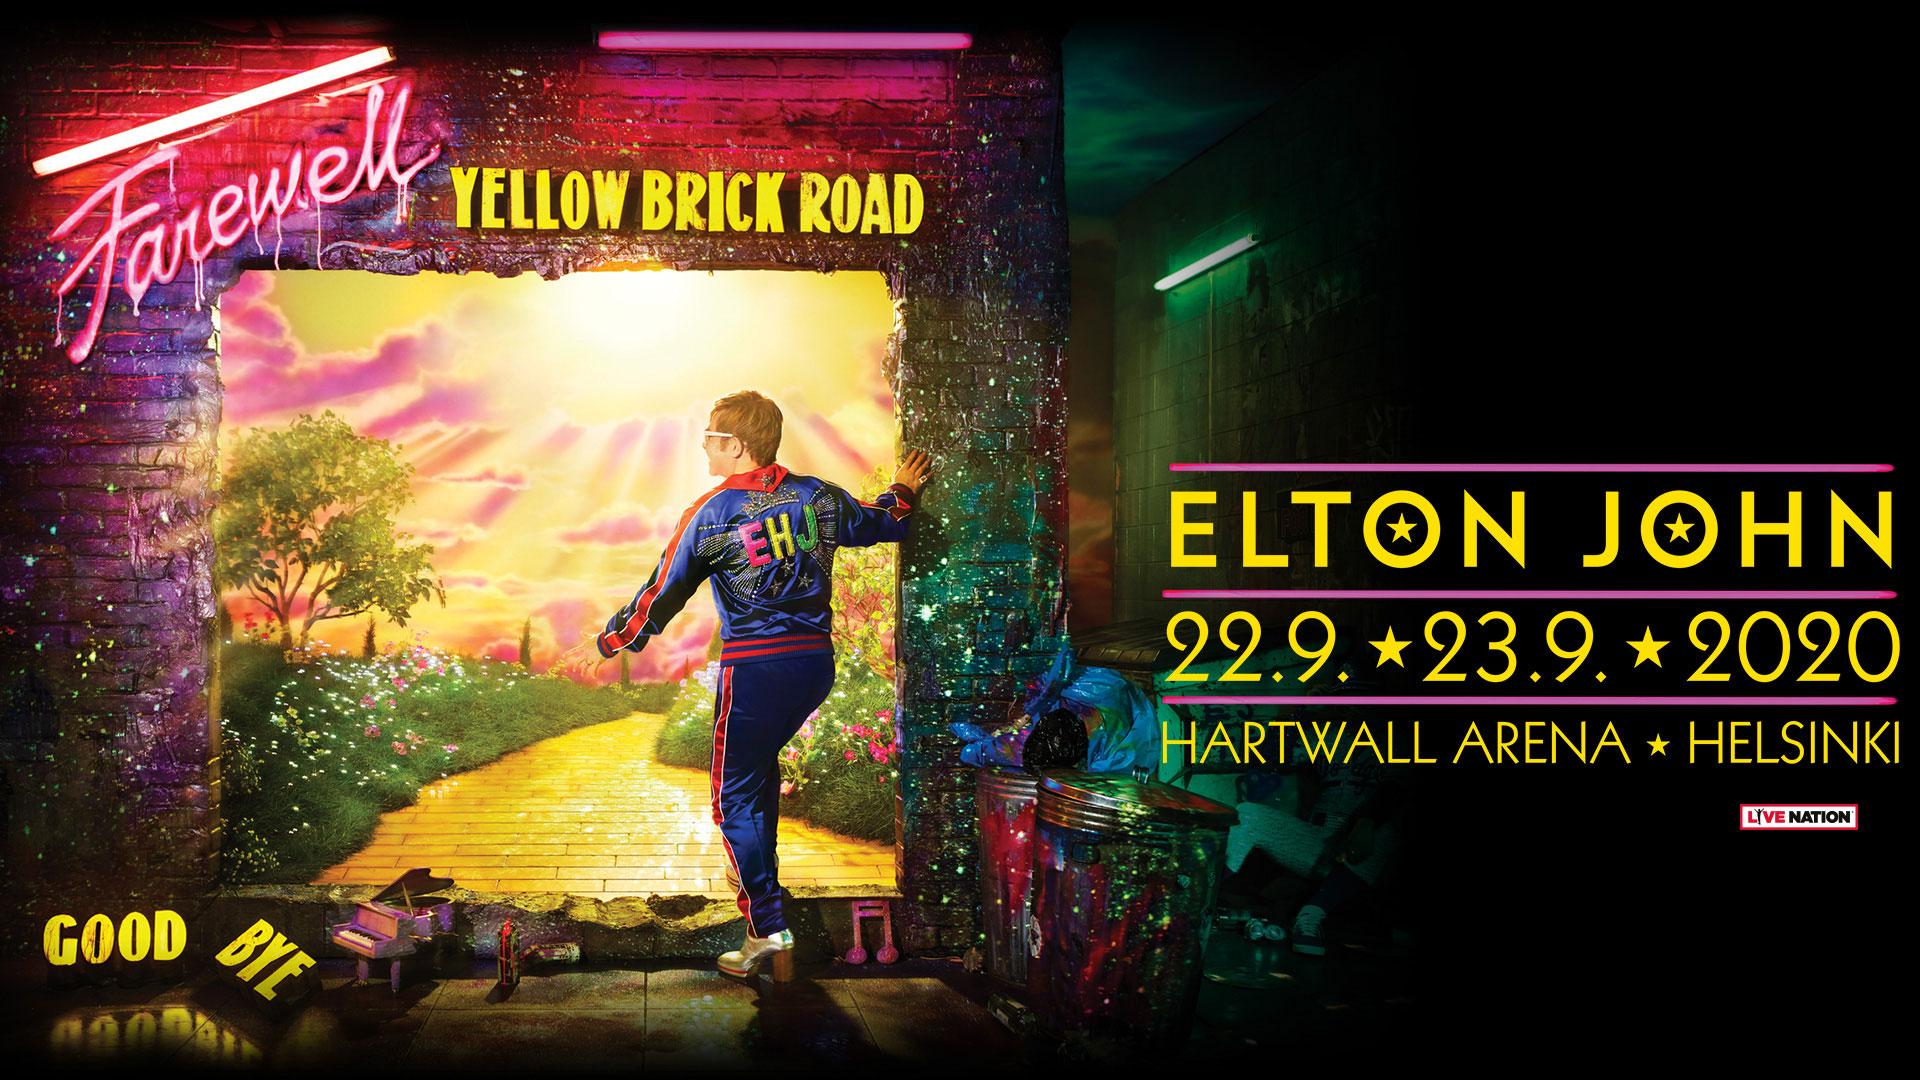 Link to event Elton John